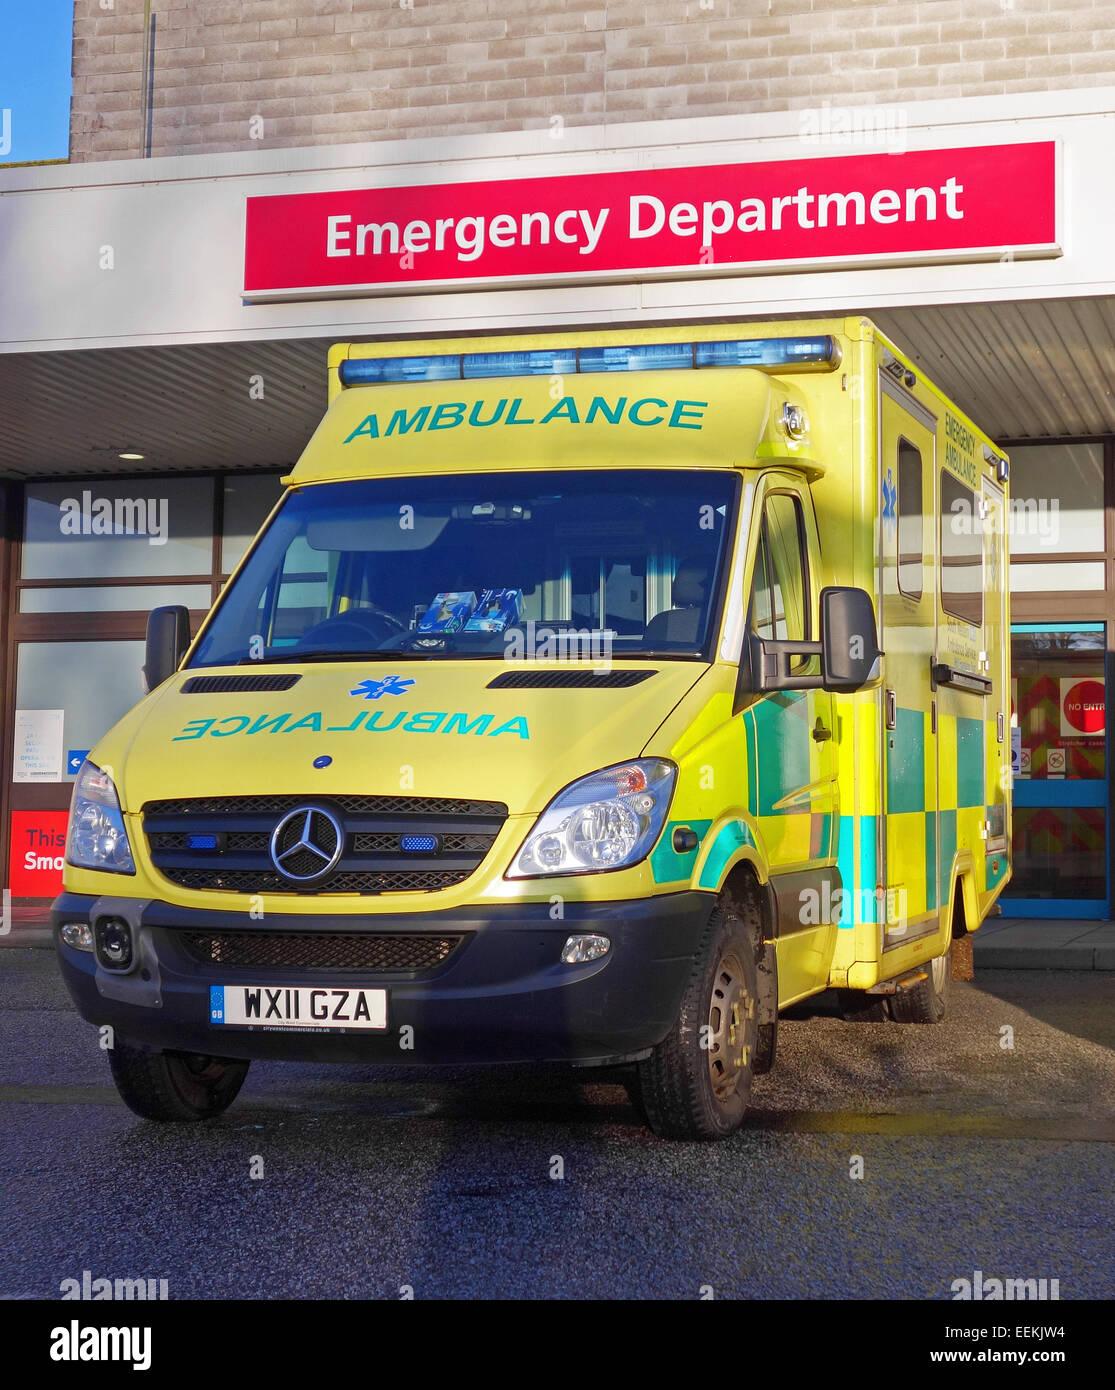 Ambulance parked outside the emergency department of a uk hospital - Stock Image